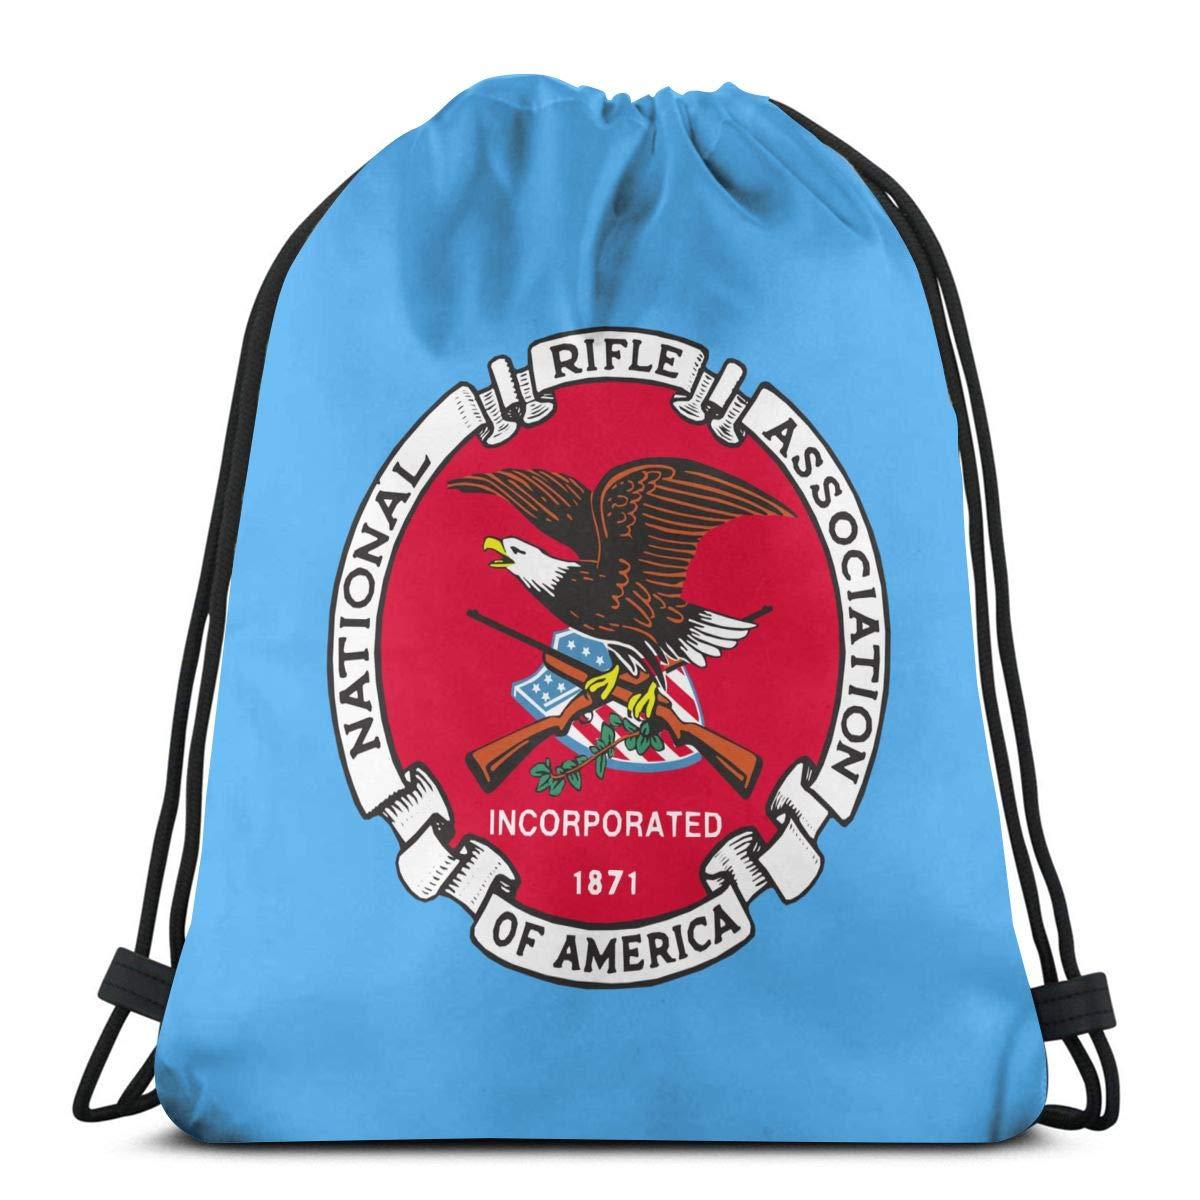 Bald-eagles Cool Gym Drawstring Bags Travel Backpack Tote School Rucksack